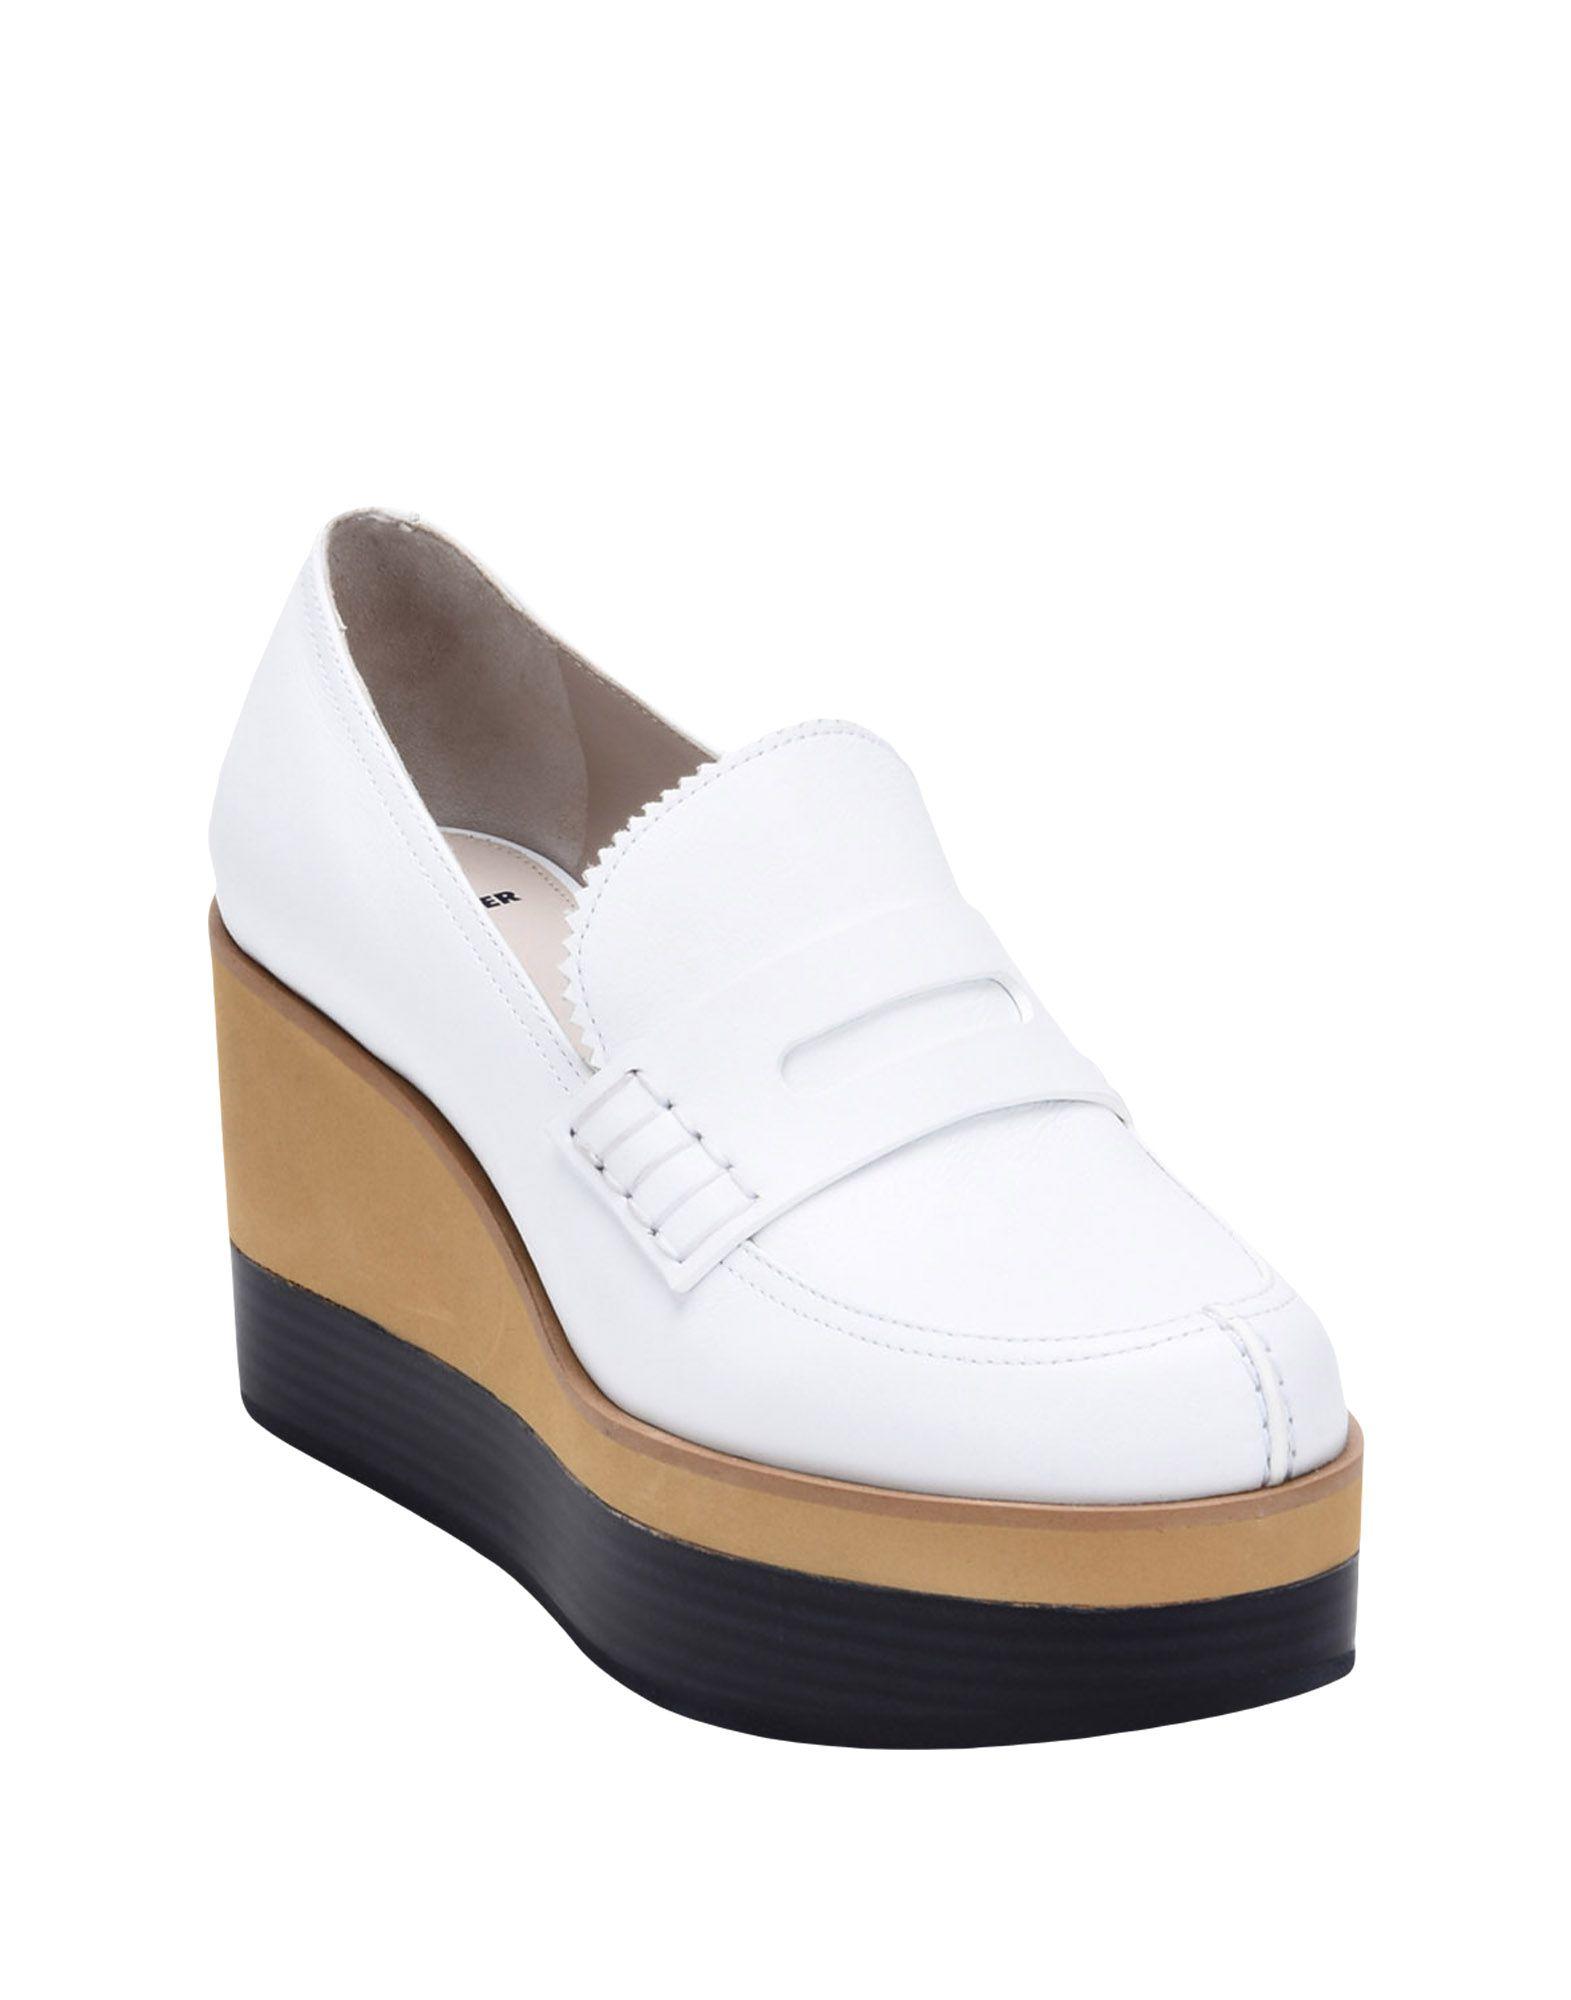 Stilvolle billige Schuhe Jil Sander Navy Mokassins Damen  11435377SS